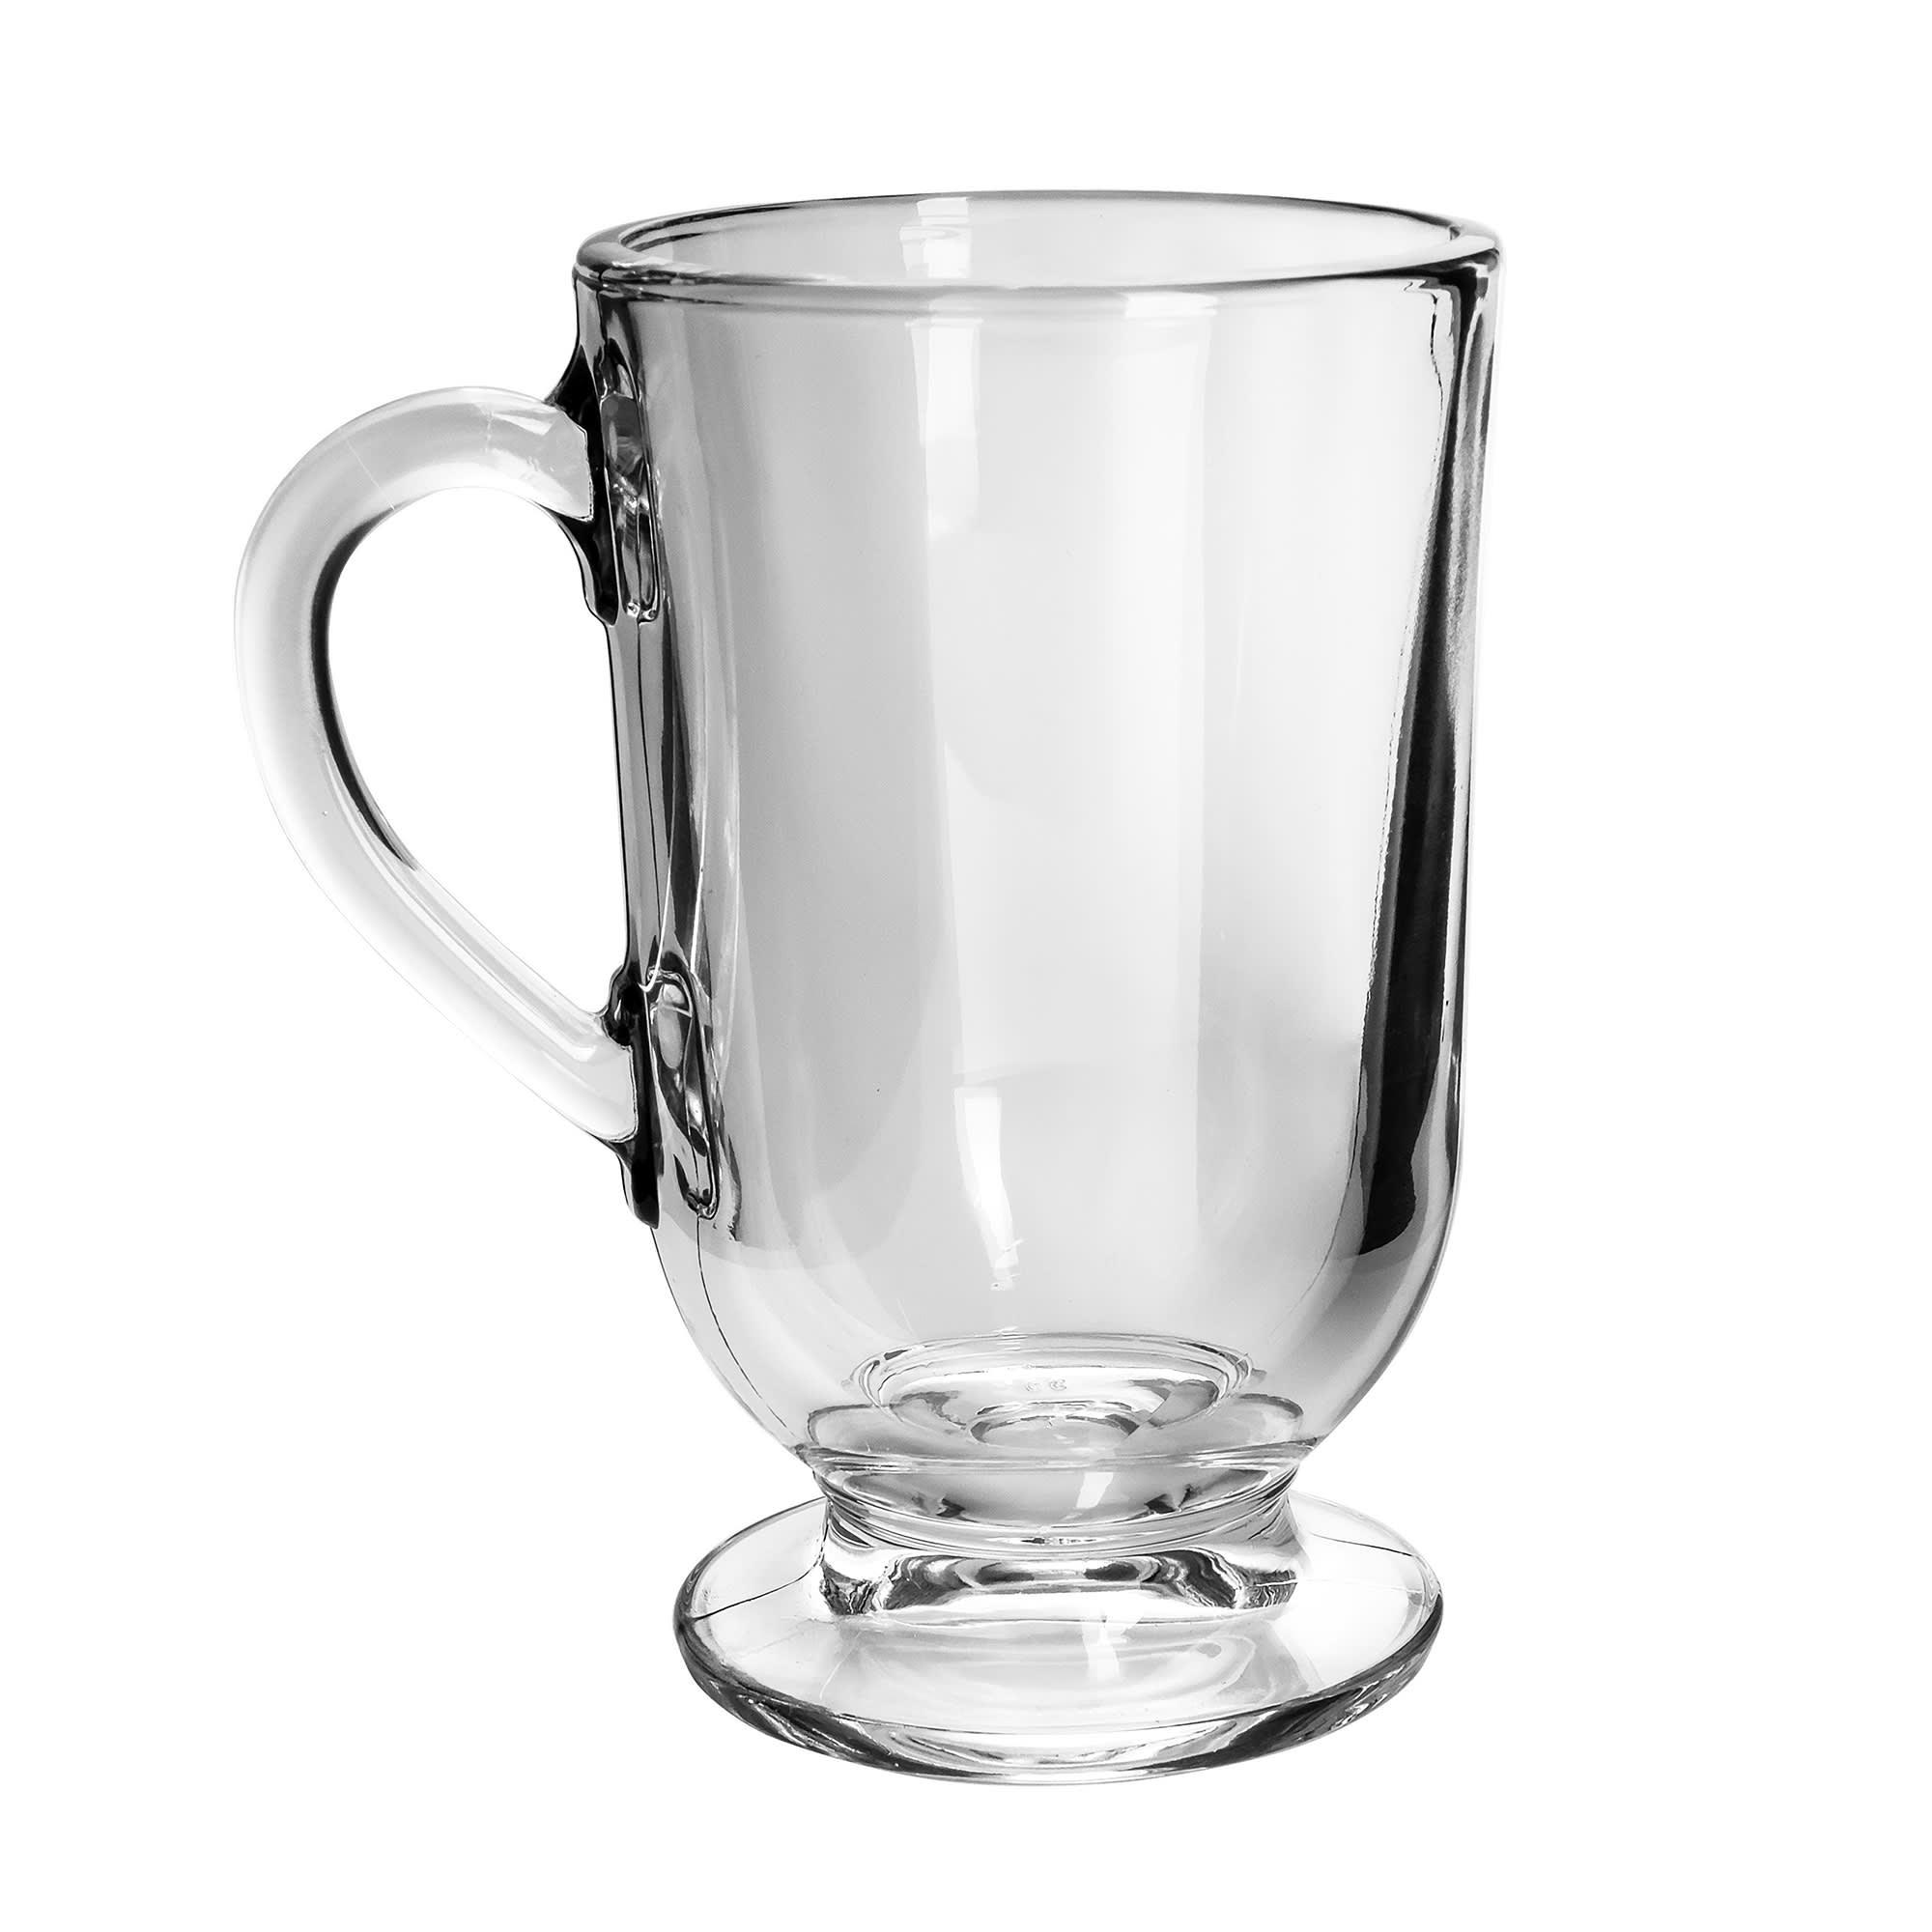 Libbey 5304 10.5 oz Irish Coffee Mug